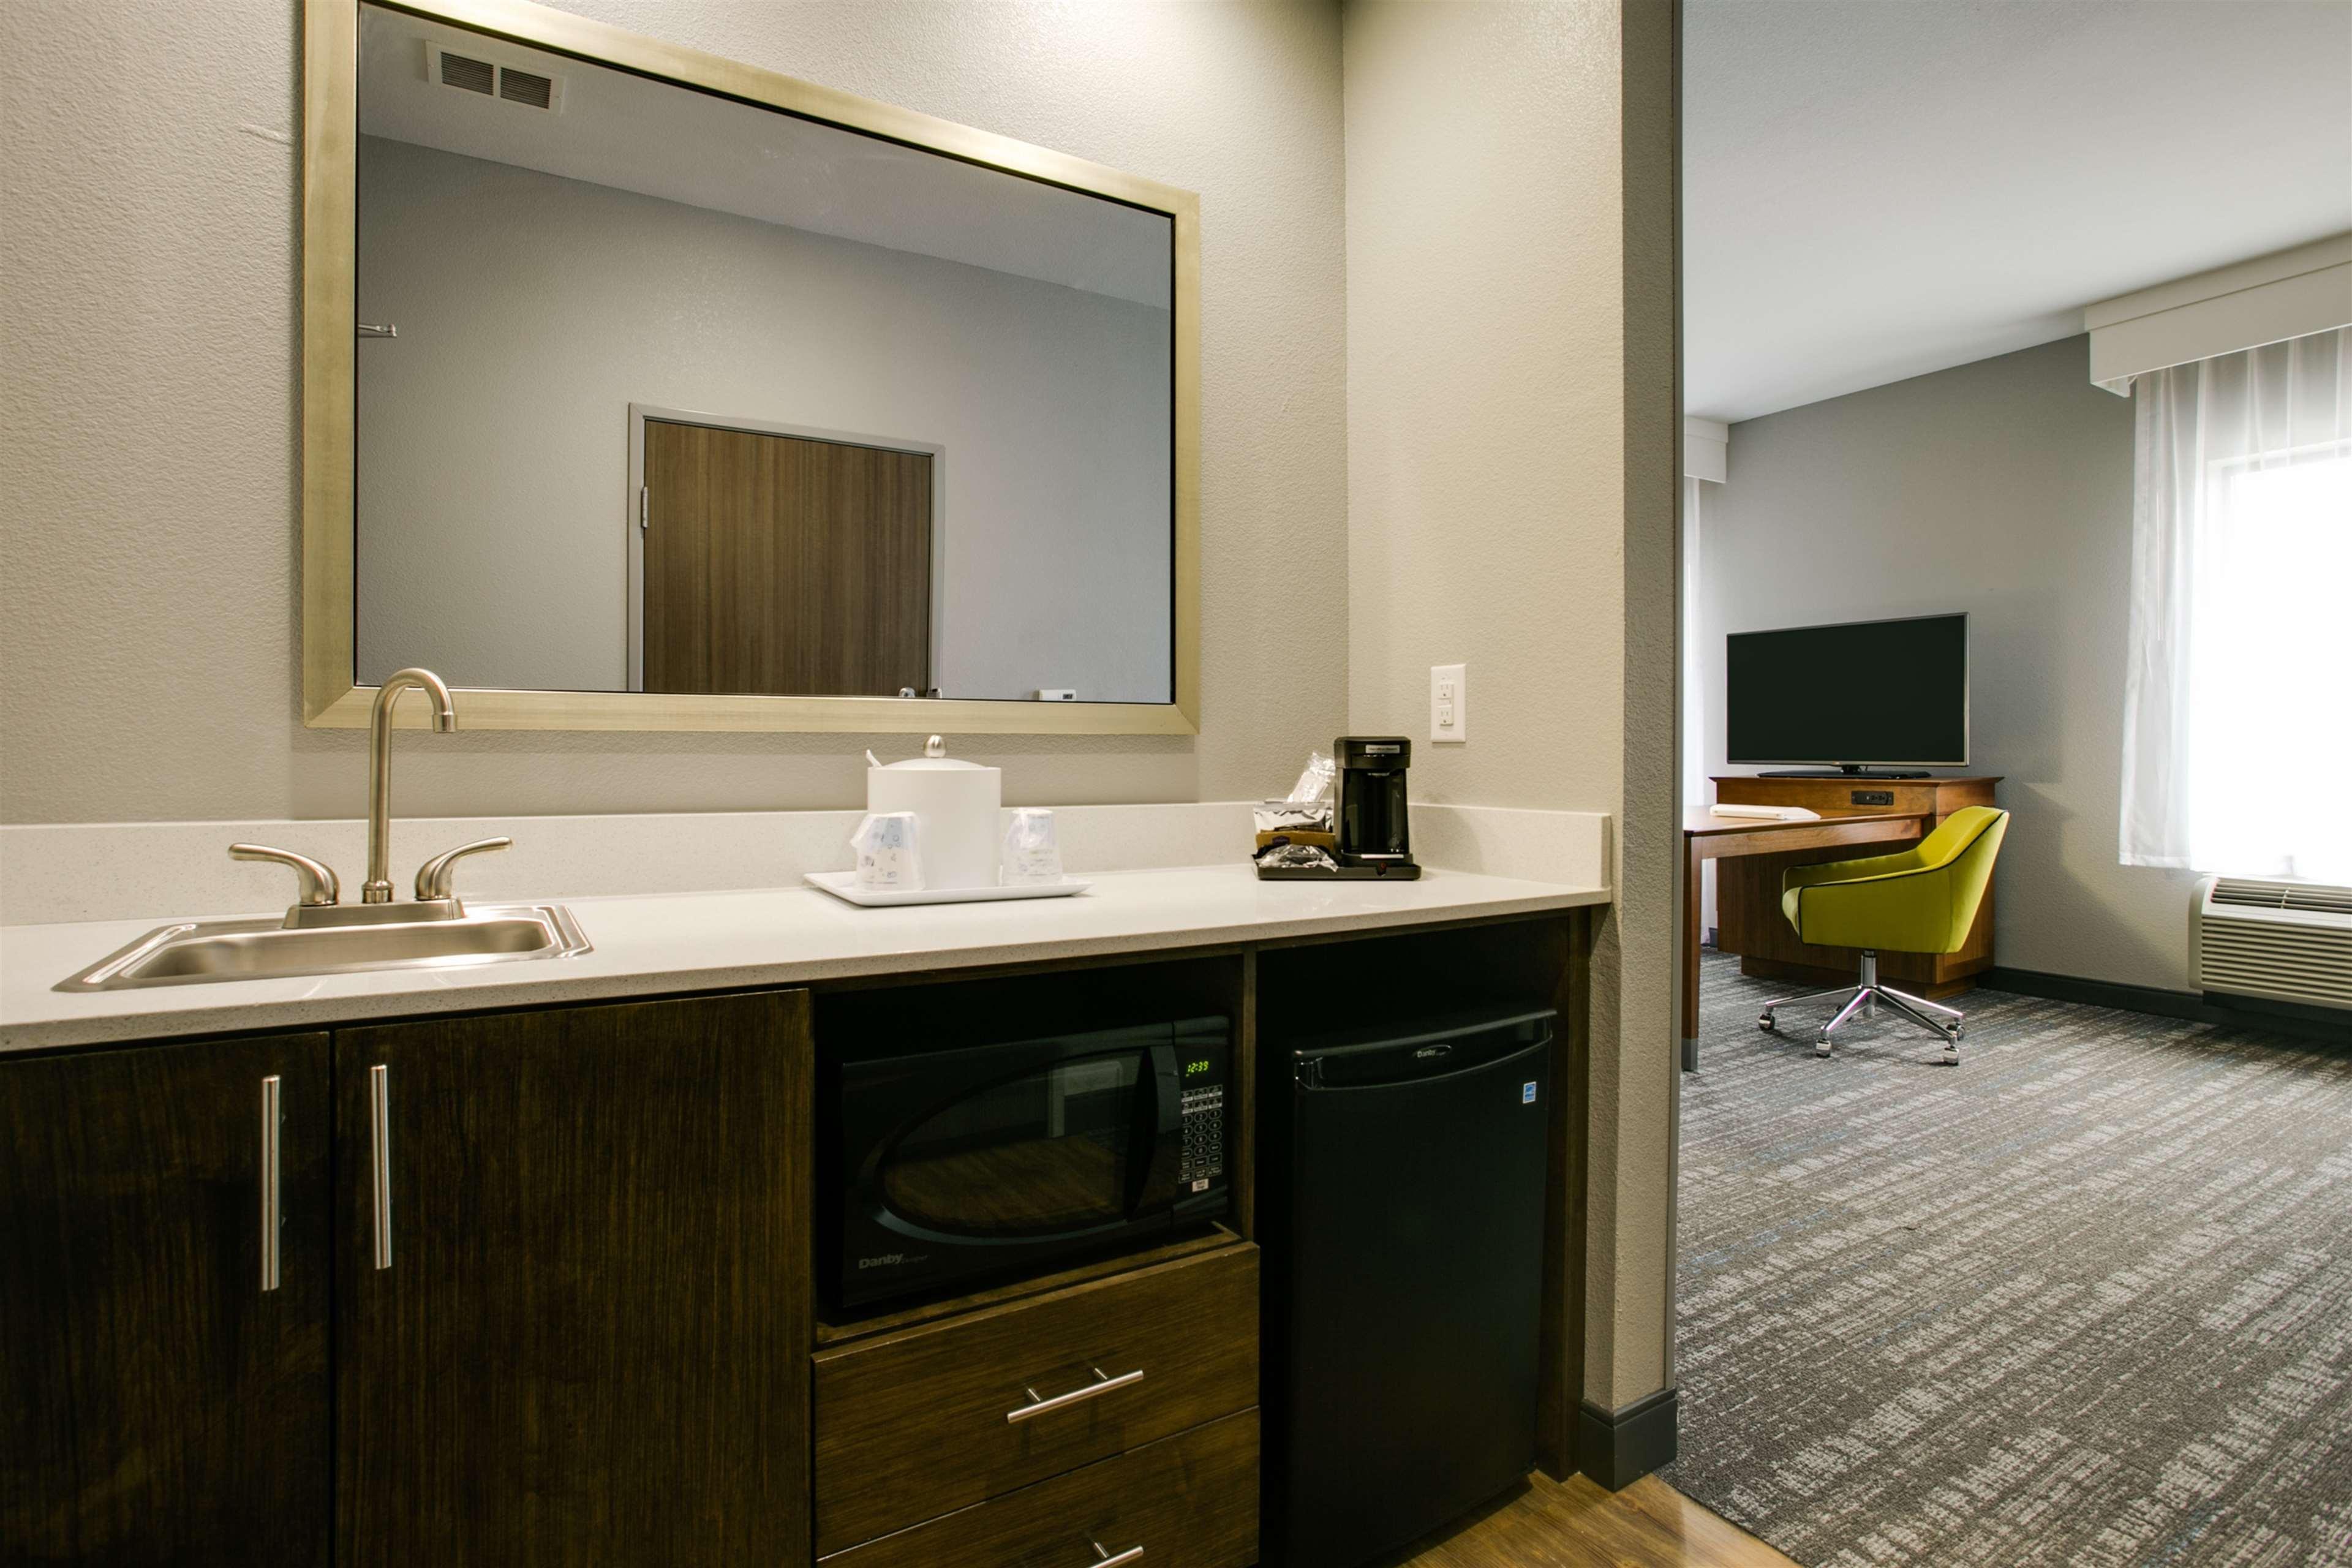 Hampton Inn & Suites Dallas/Ft. Worth Airport South image 27